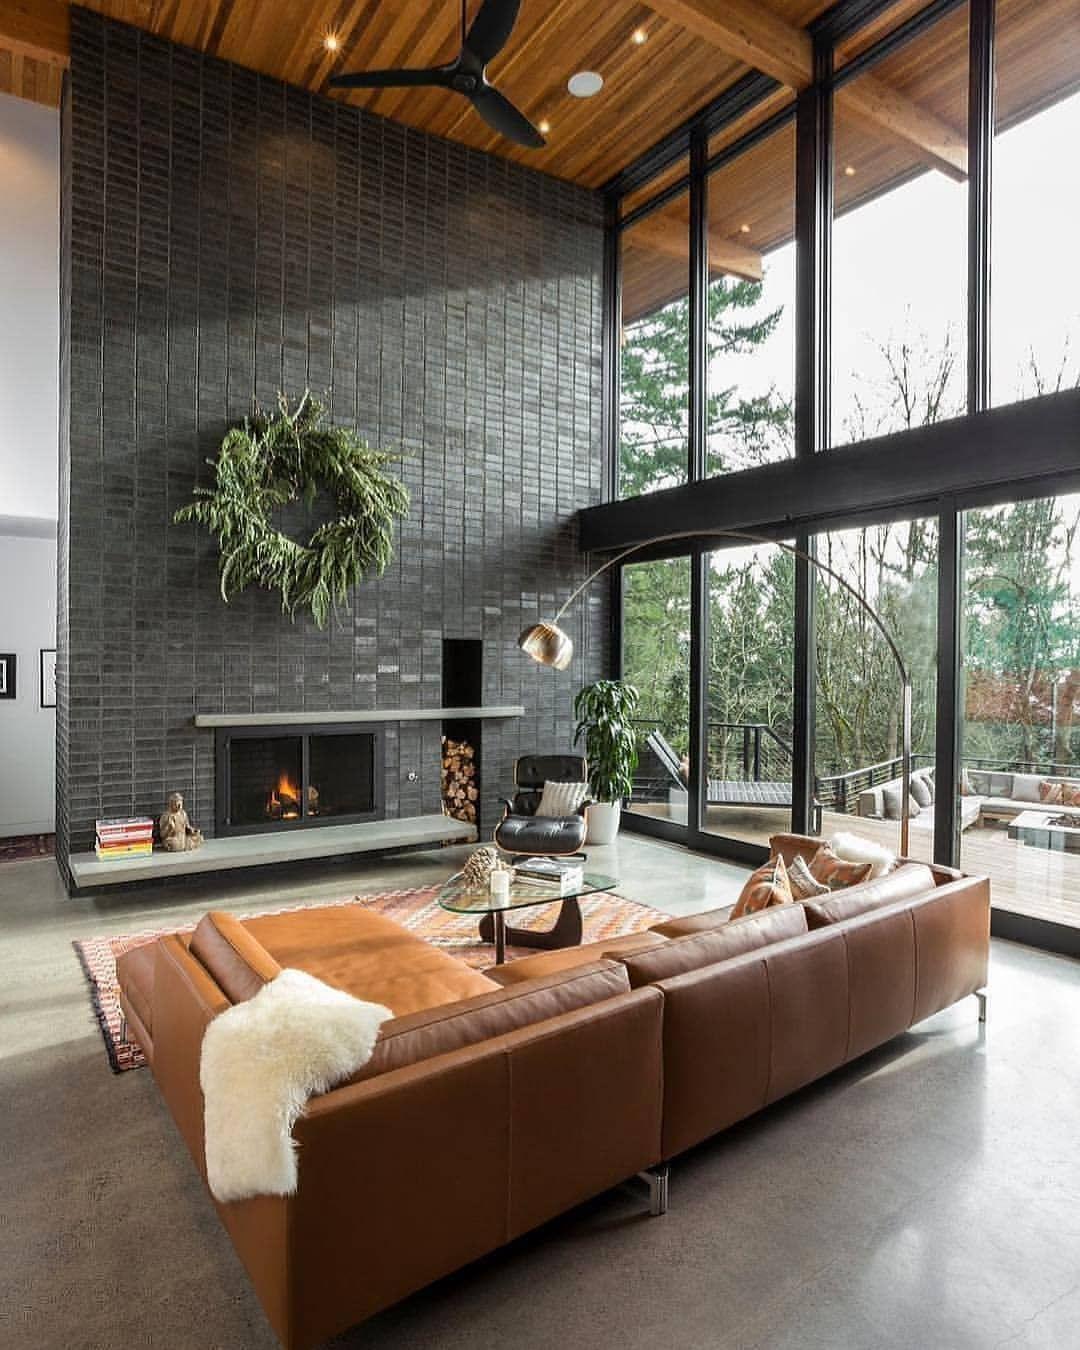 Interior Design Portland Oregon: The Greenhills House 📐 Designed By Craig Wollen Architect